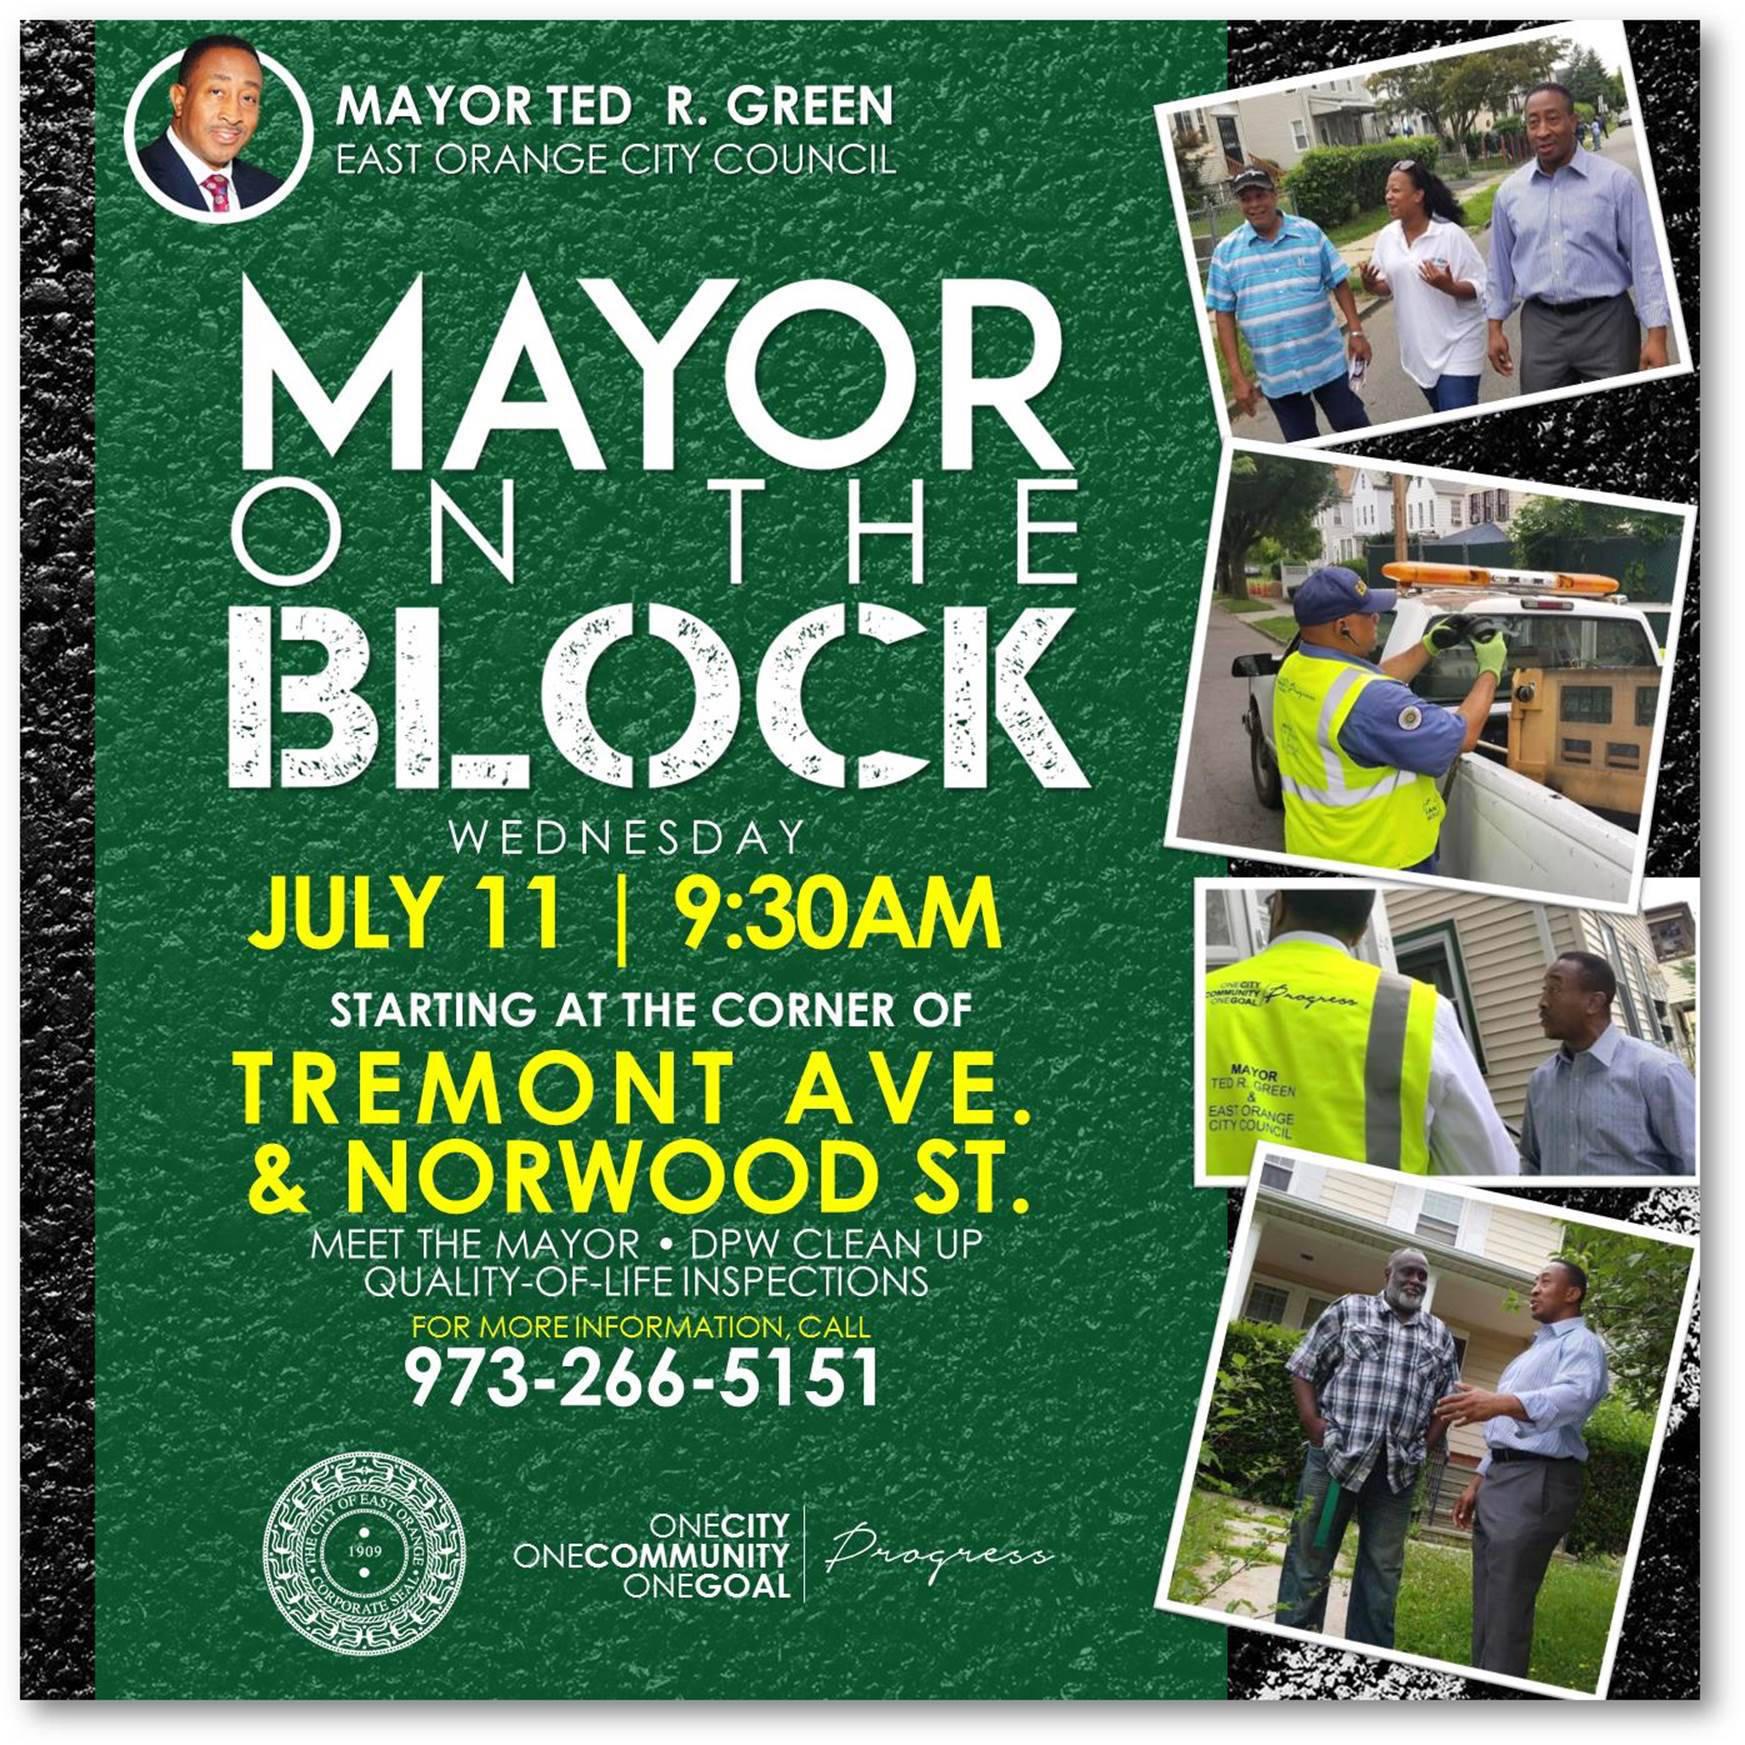 83ad6a4b51094854b252_mayor_on_the_block.jpg